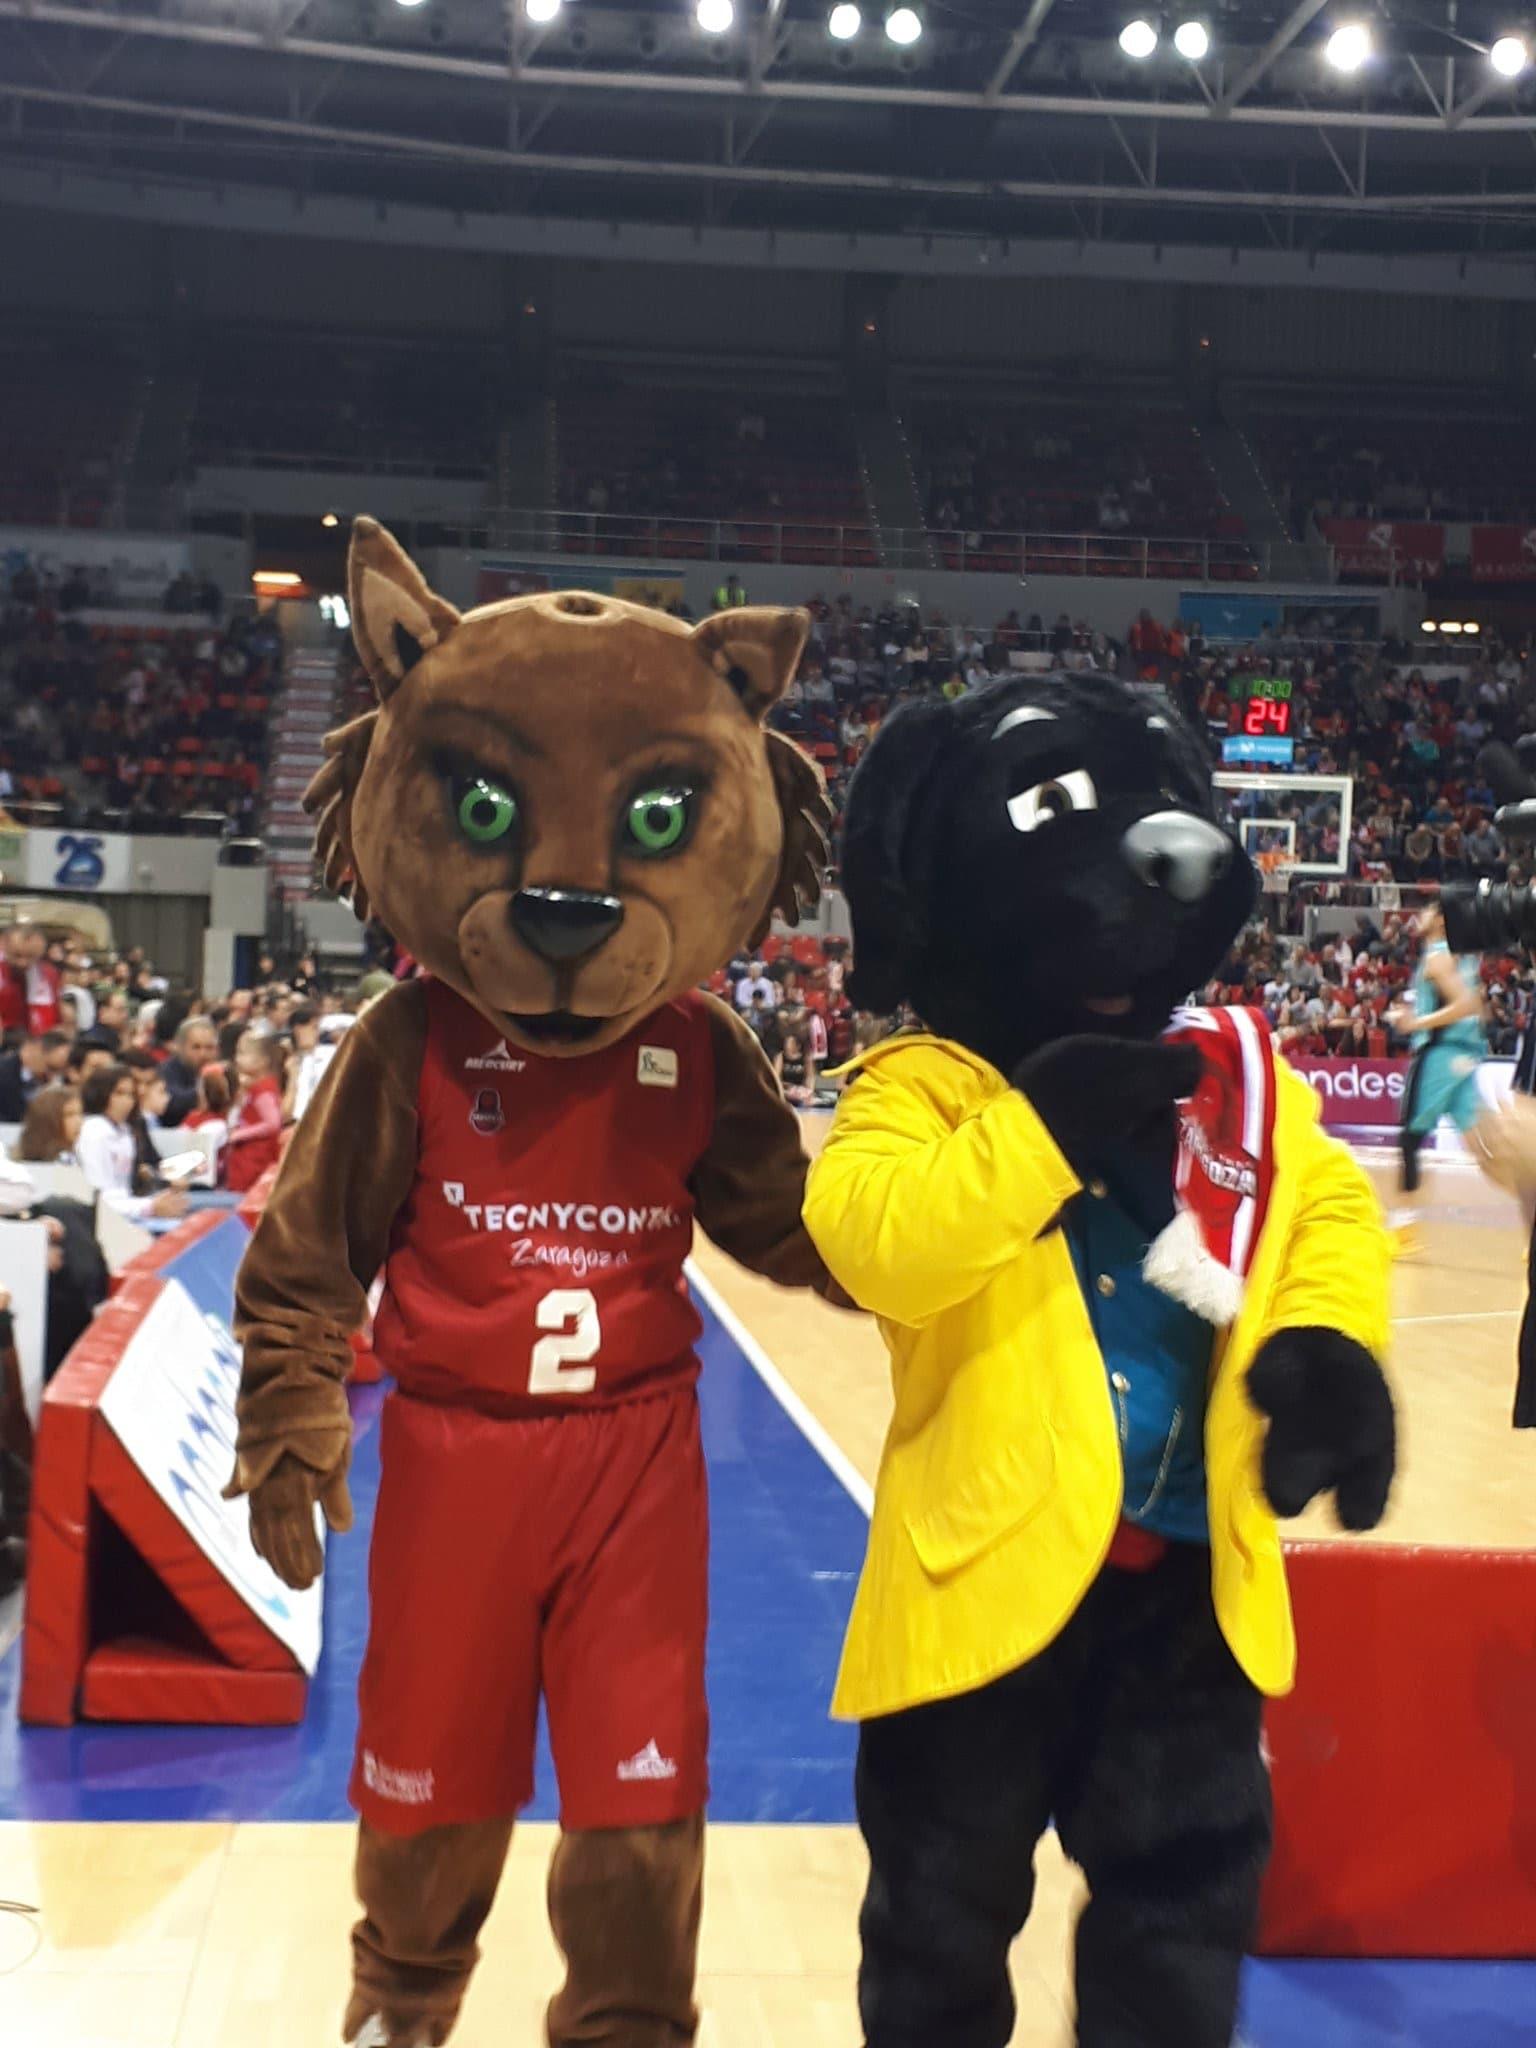 Mascota Publicitaria y deportiva Kangaroo